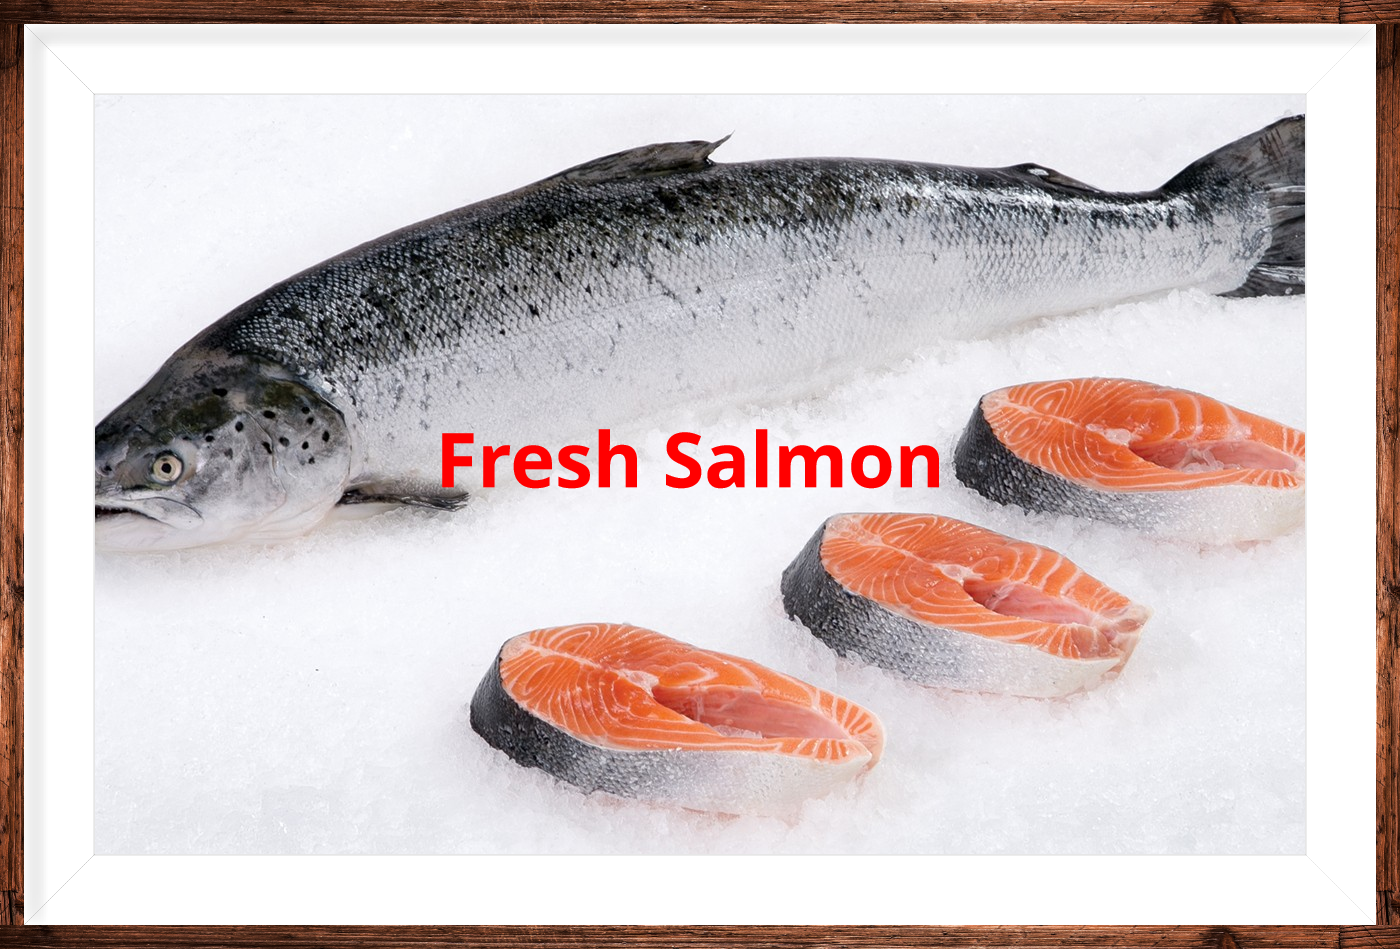 https://0201.nccdn.net/4_2/000/000/06b/a1b/salmon.png